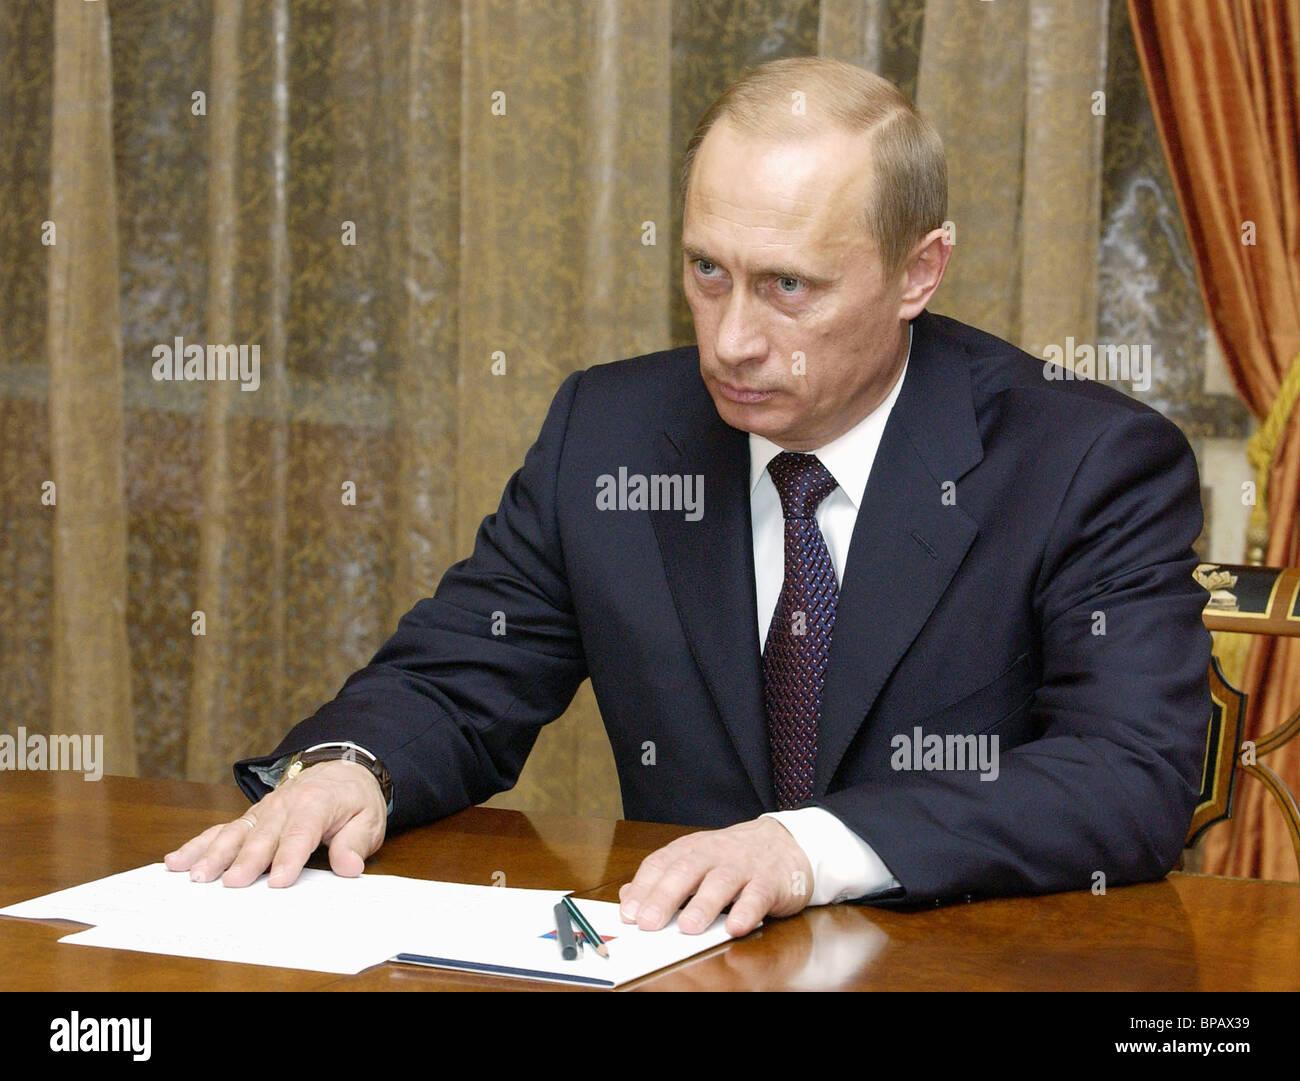 Putin met with Duma leaders - Stock Image